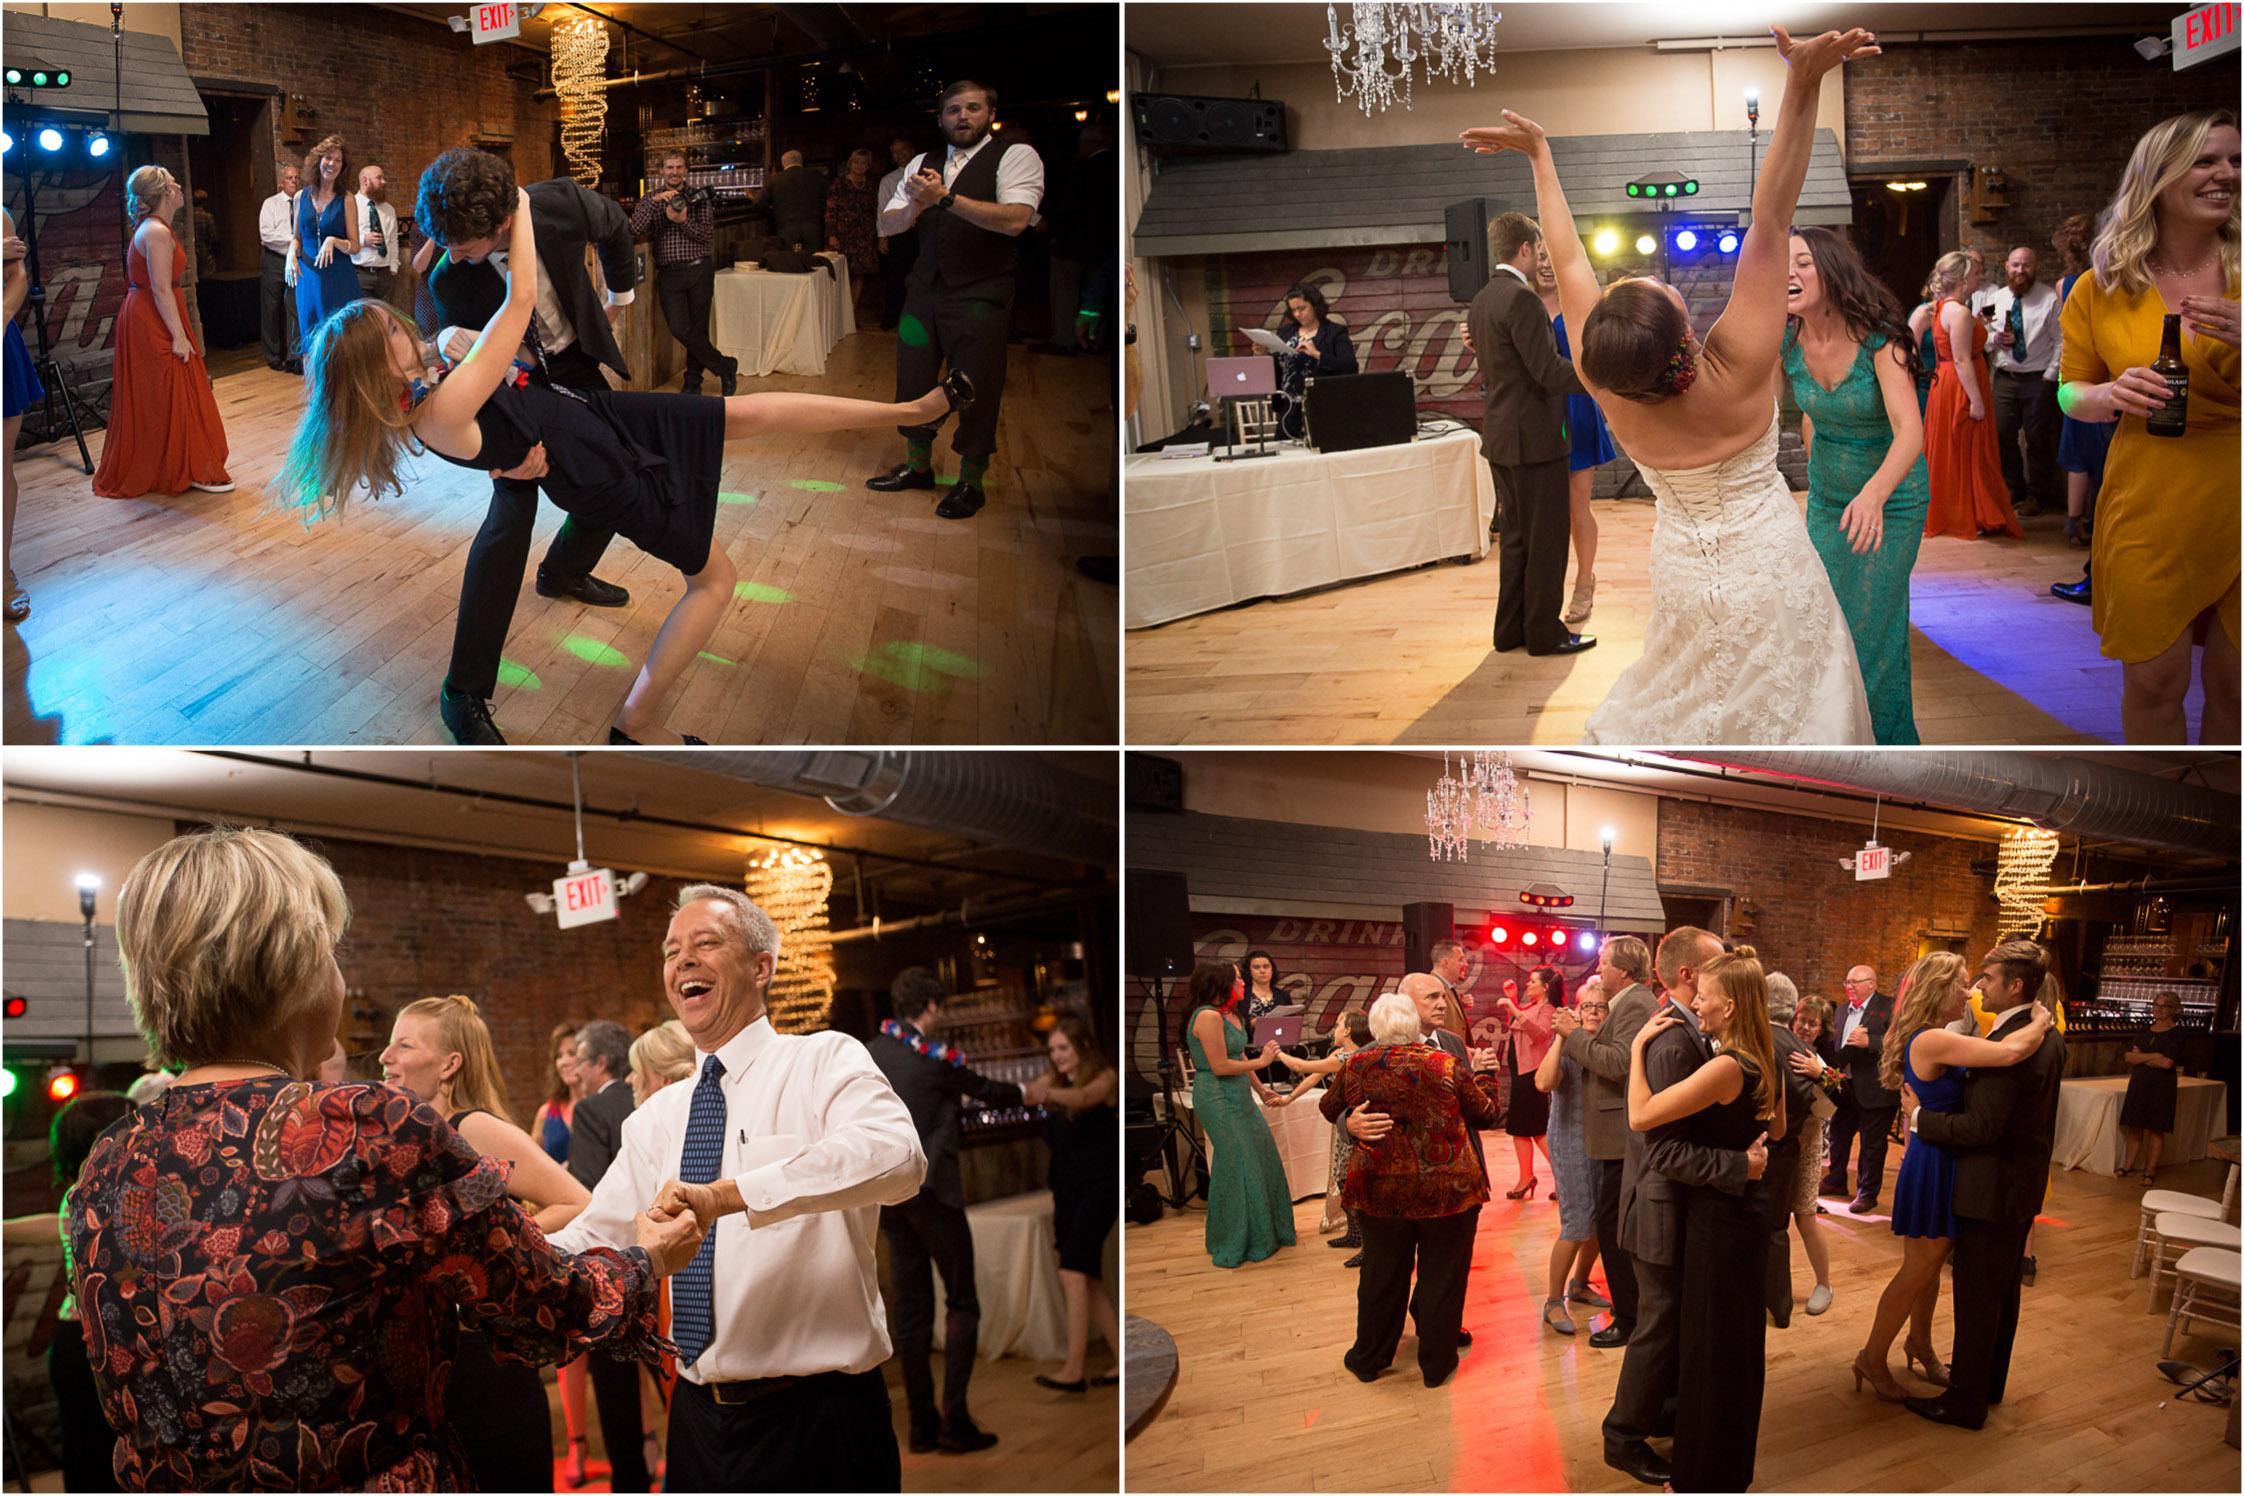 32-loft-at-studio-j-stillwater-mn-wedding-reception-fun-guests-dance-minnesota-photographer-mahonen-photography.jpg